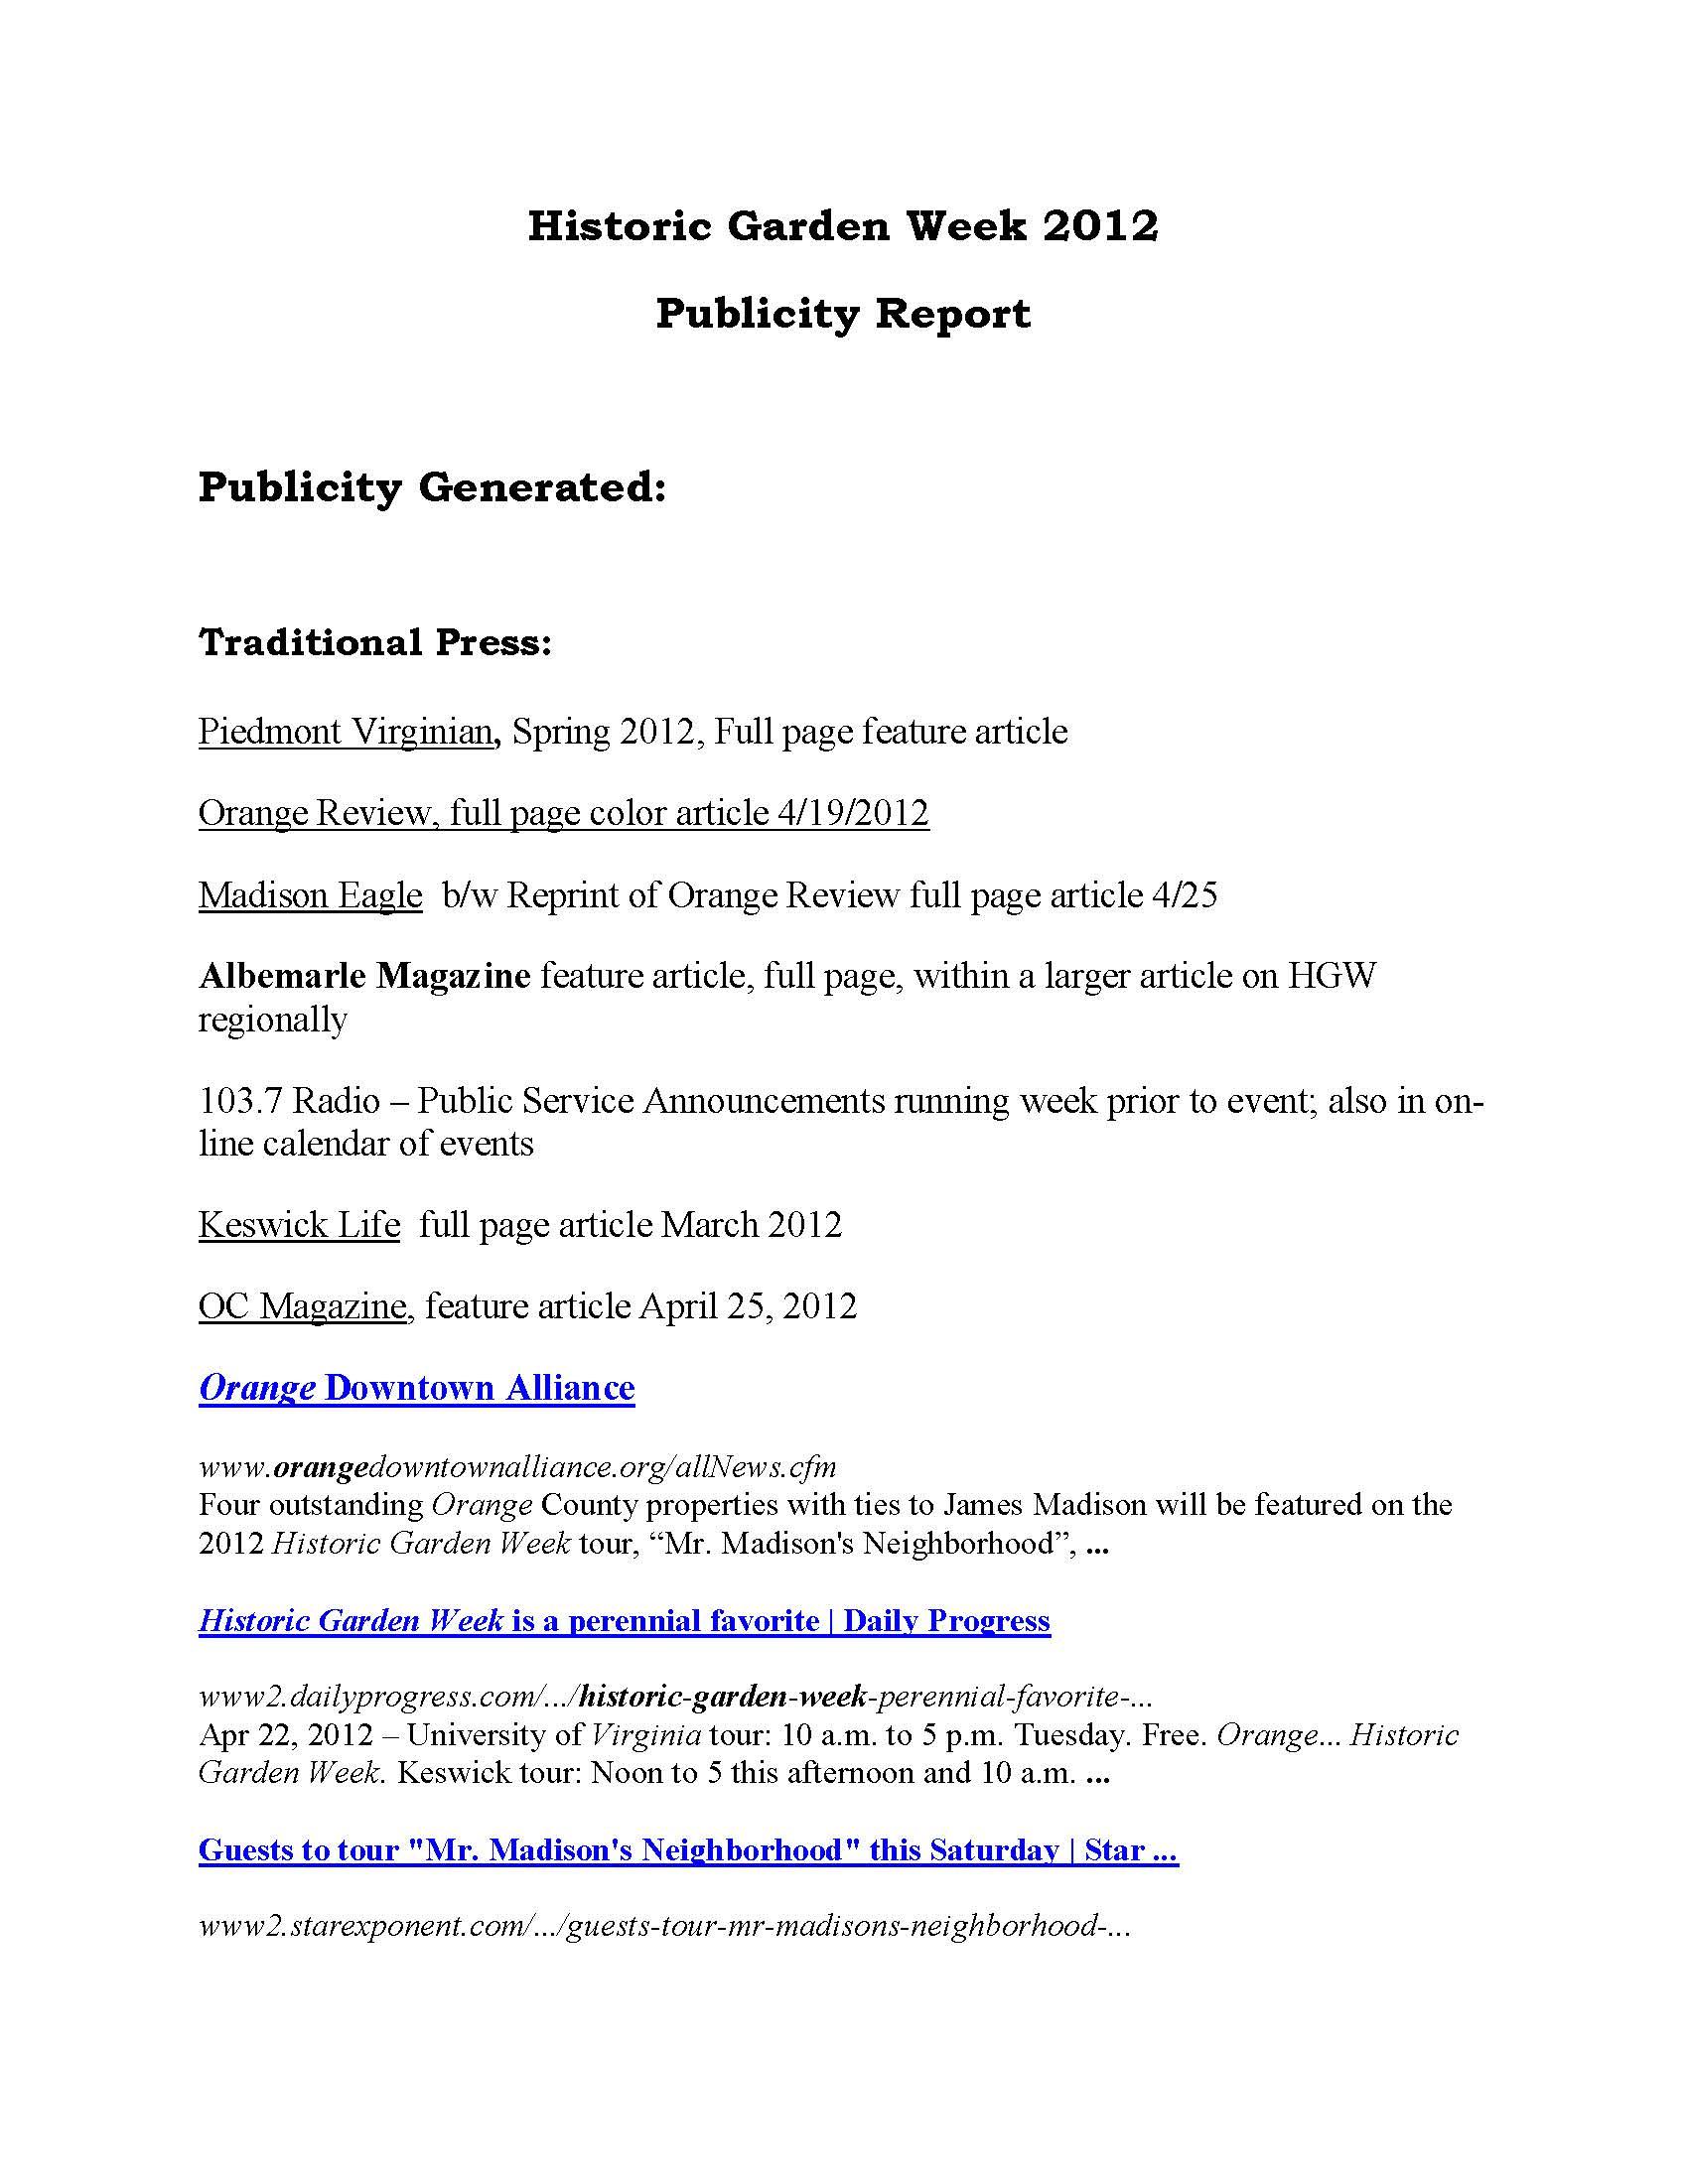 Historic-Garden-Week-2012-final-report_Page_1